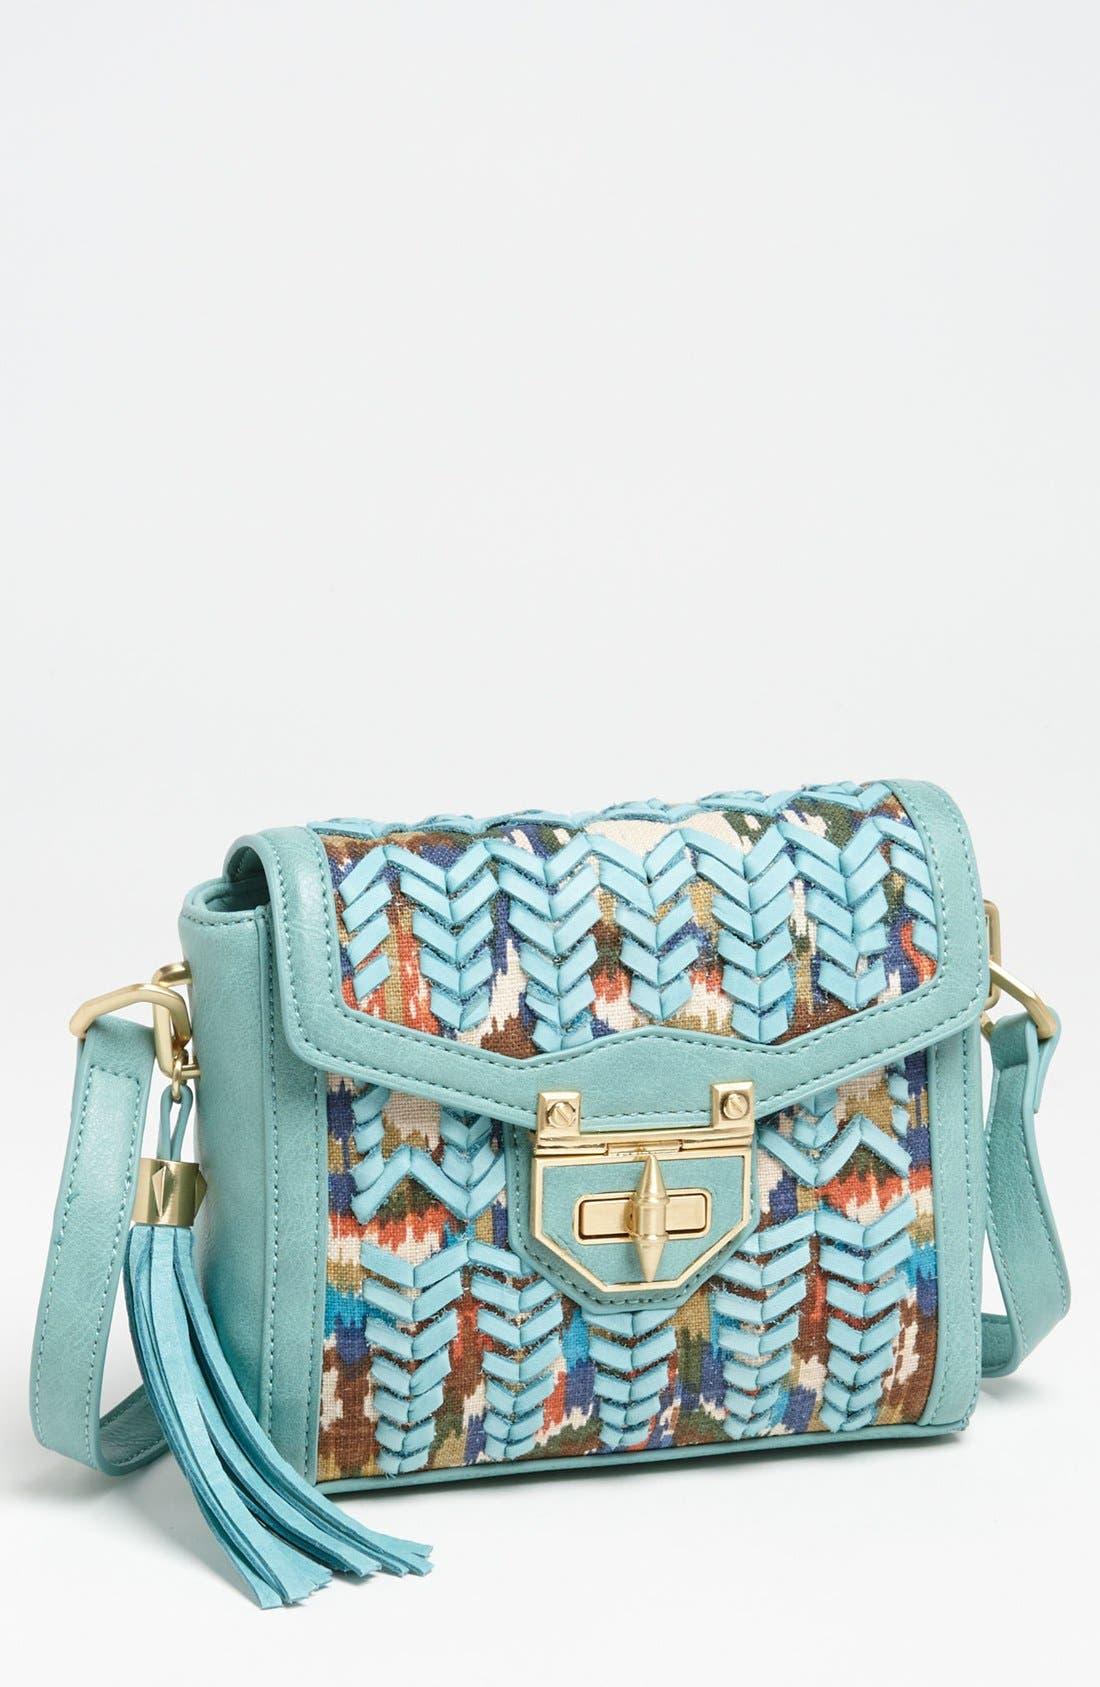 Main Image - Sam Edelman 'Neo-Tribe Savannah' Crossbody Bag